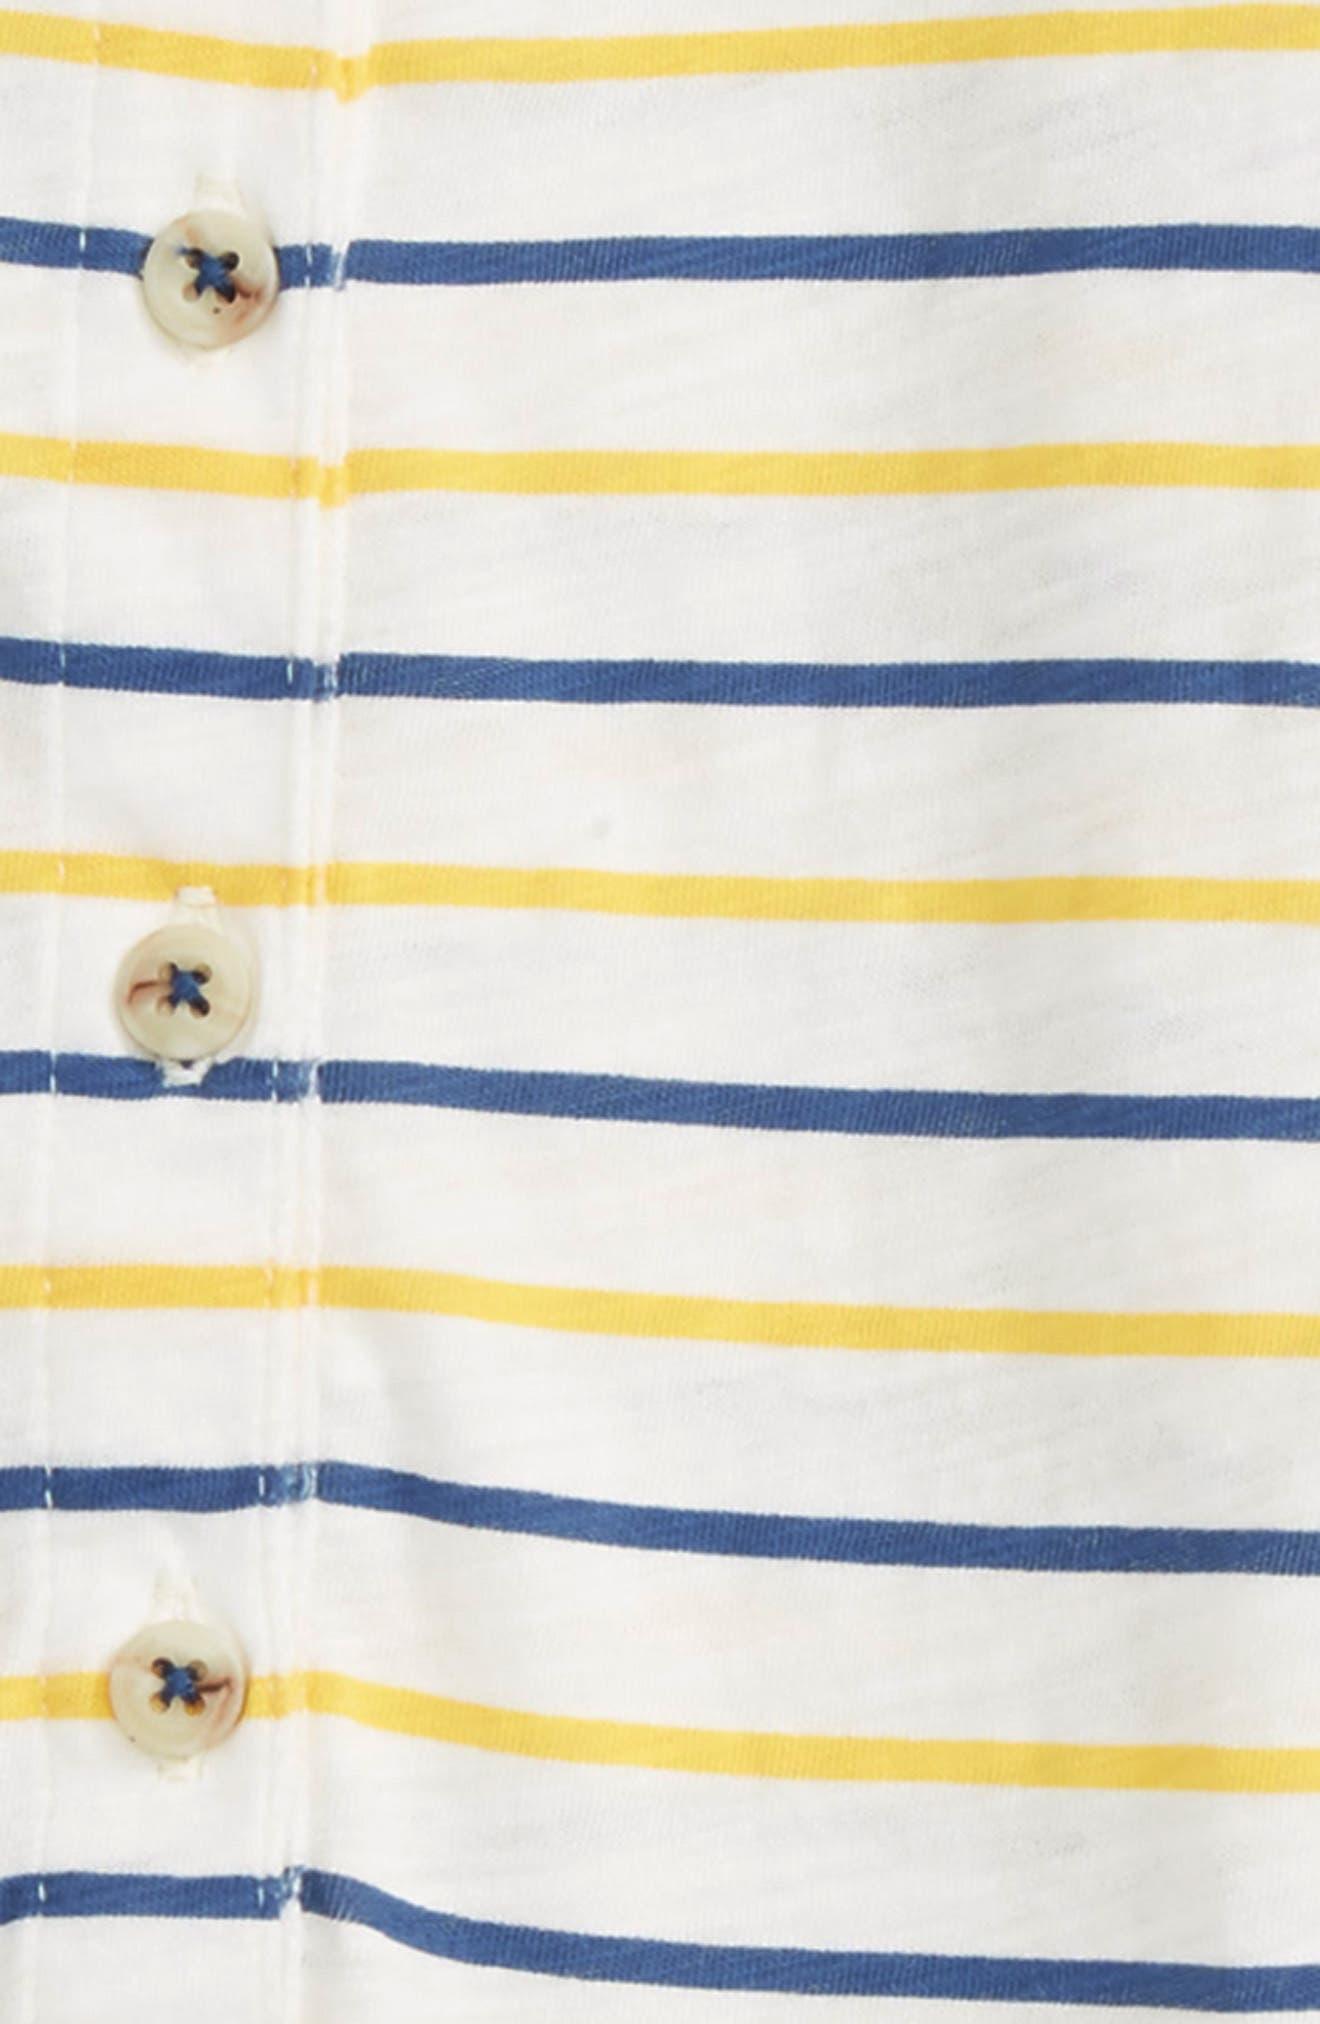 Peek Stripe Hooded Romper,                             Alternate thumbnail 3, color,                             700